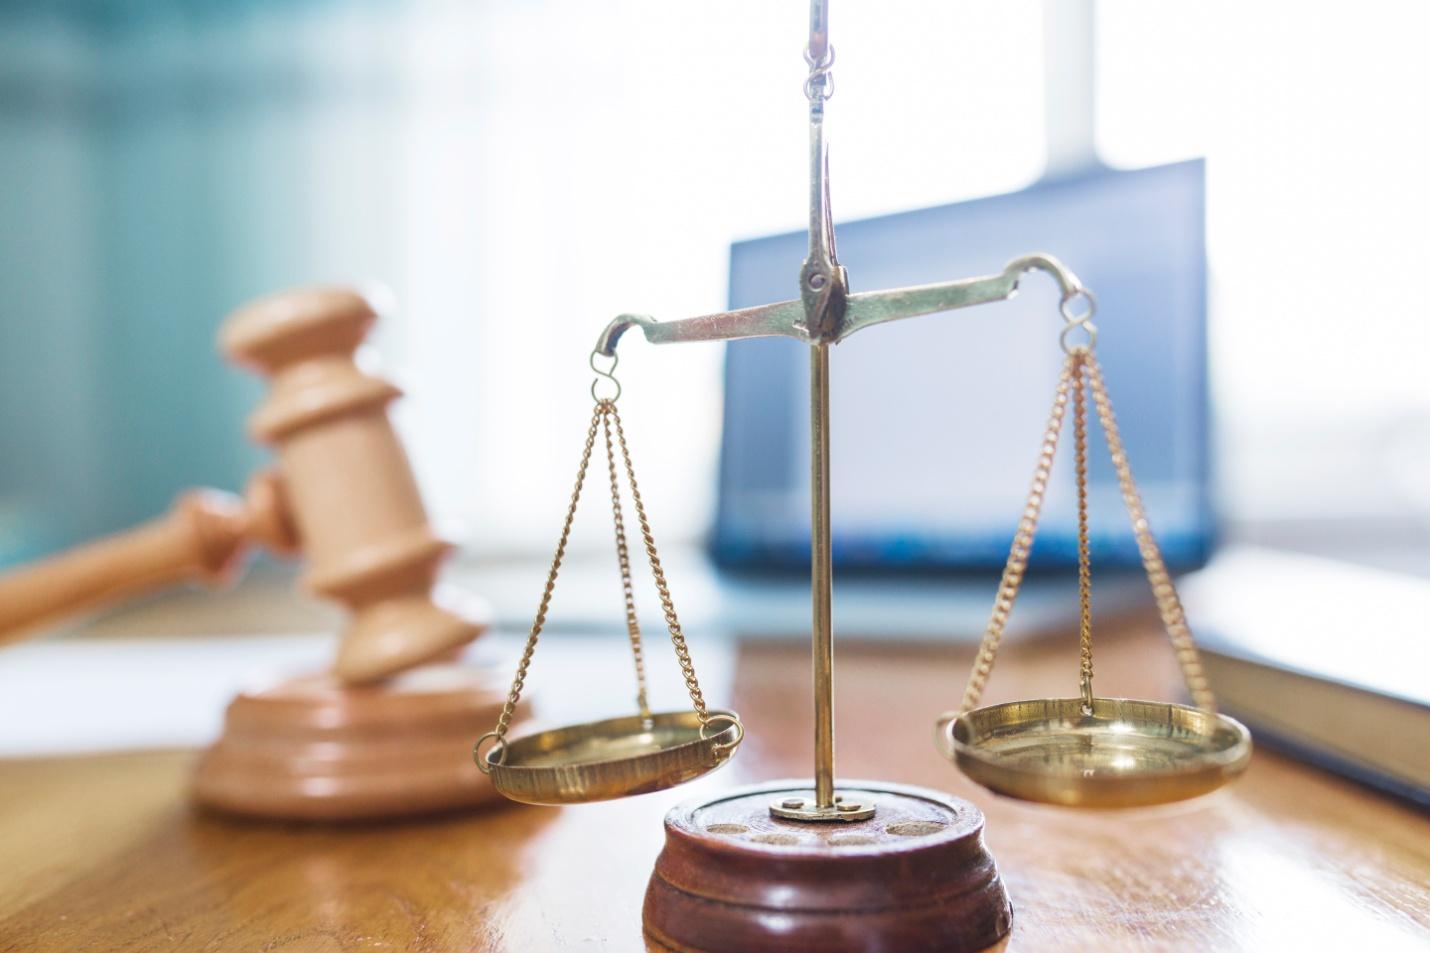 Pandangan Masalah Hukum